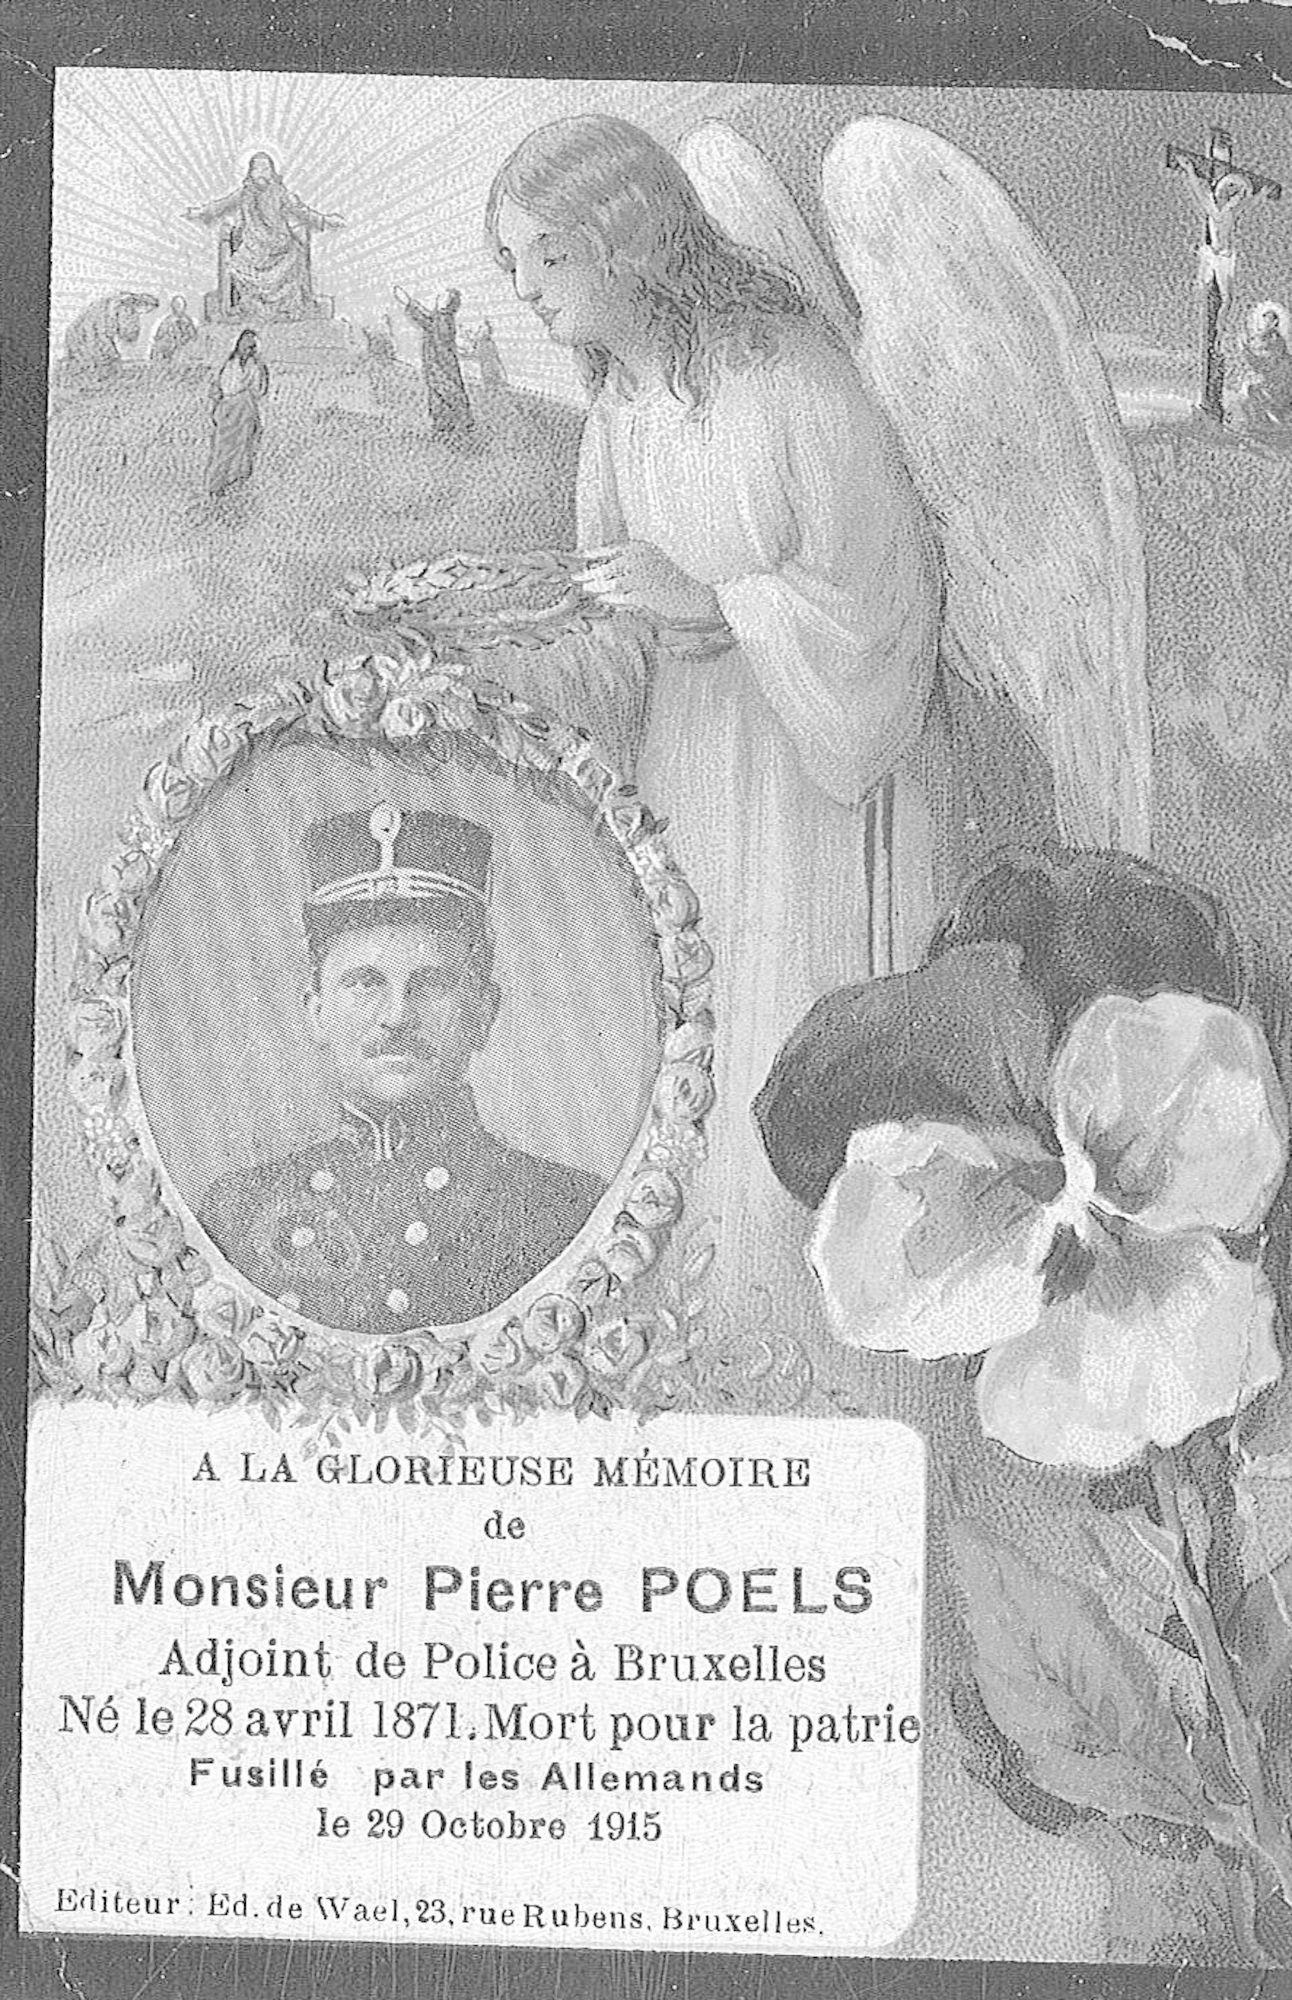 Pierre Poels